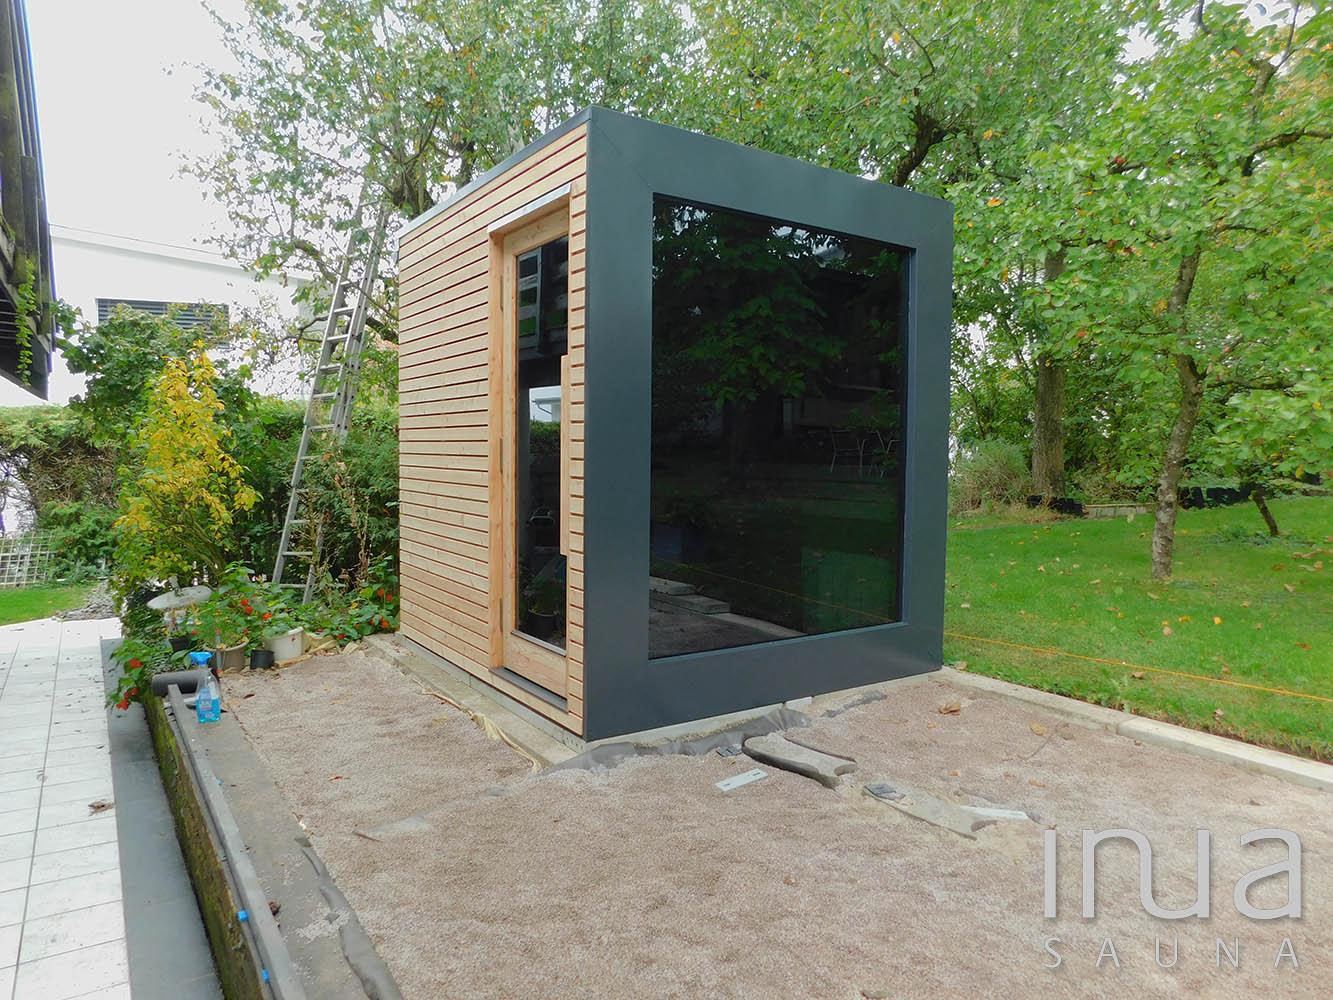 INUA-Udendoers-Sauna-Oberbuchsiten_Schweiz